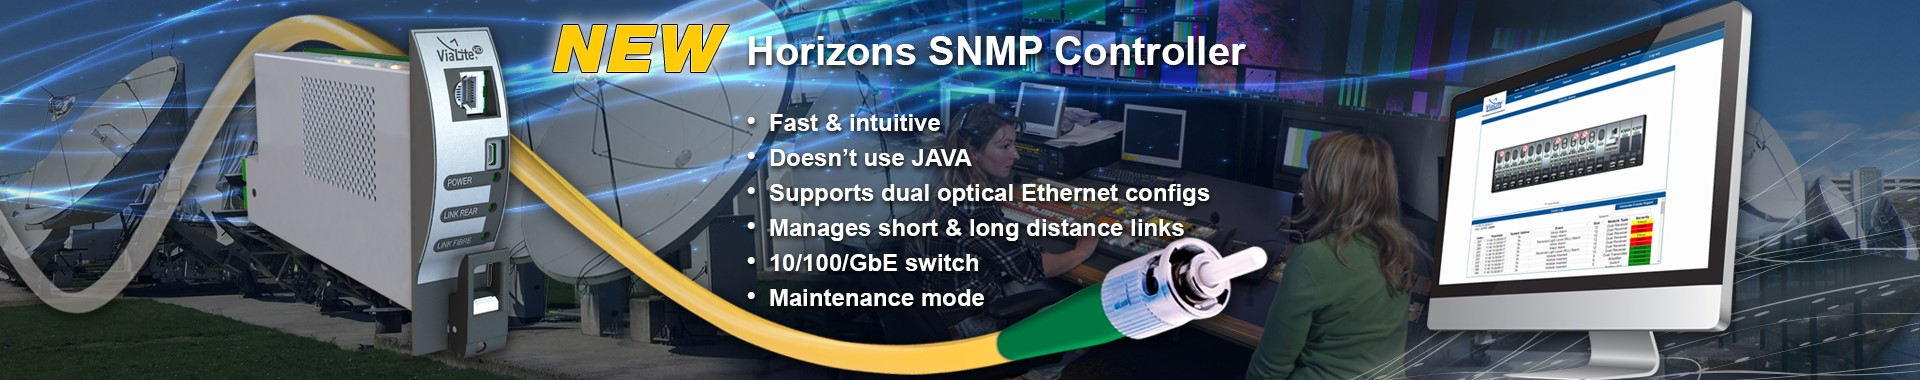 ViaLite Horizons SNMP slider